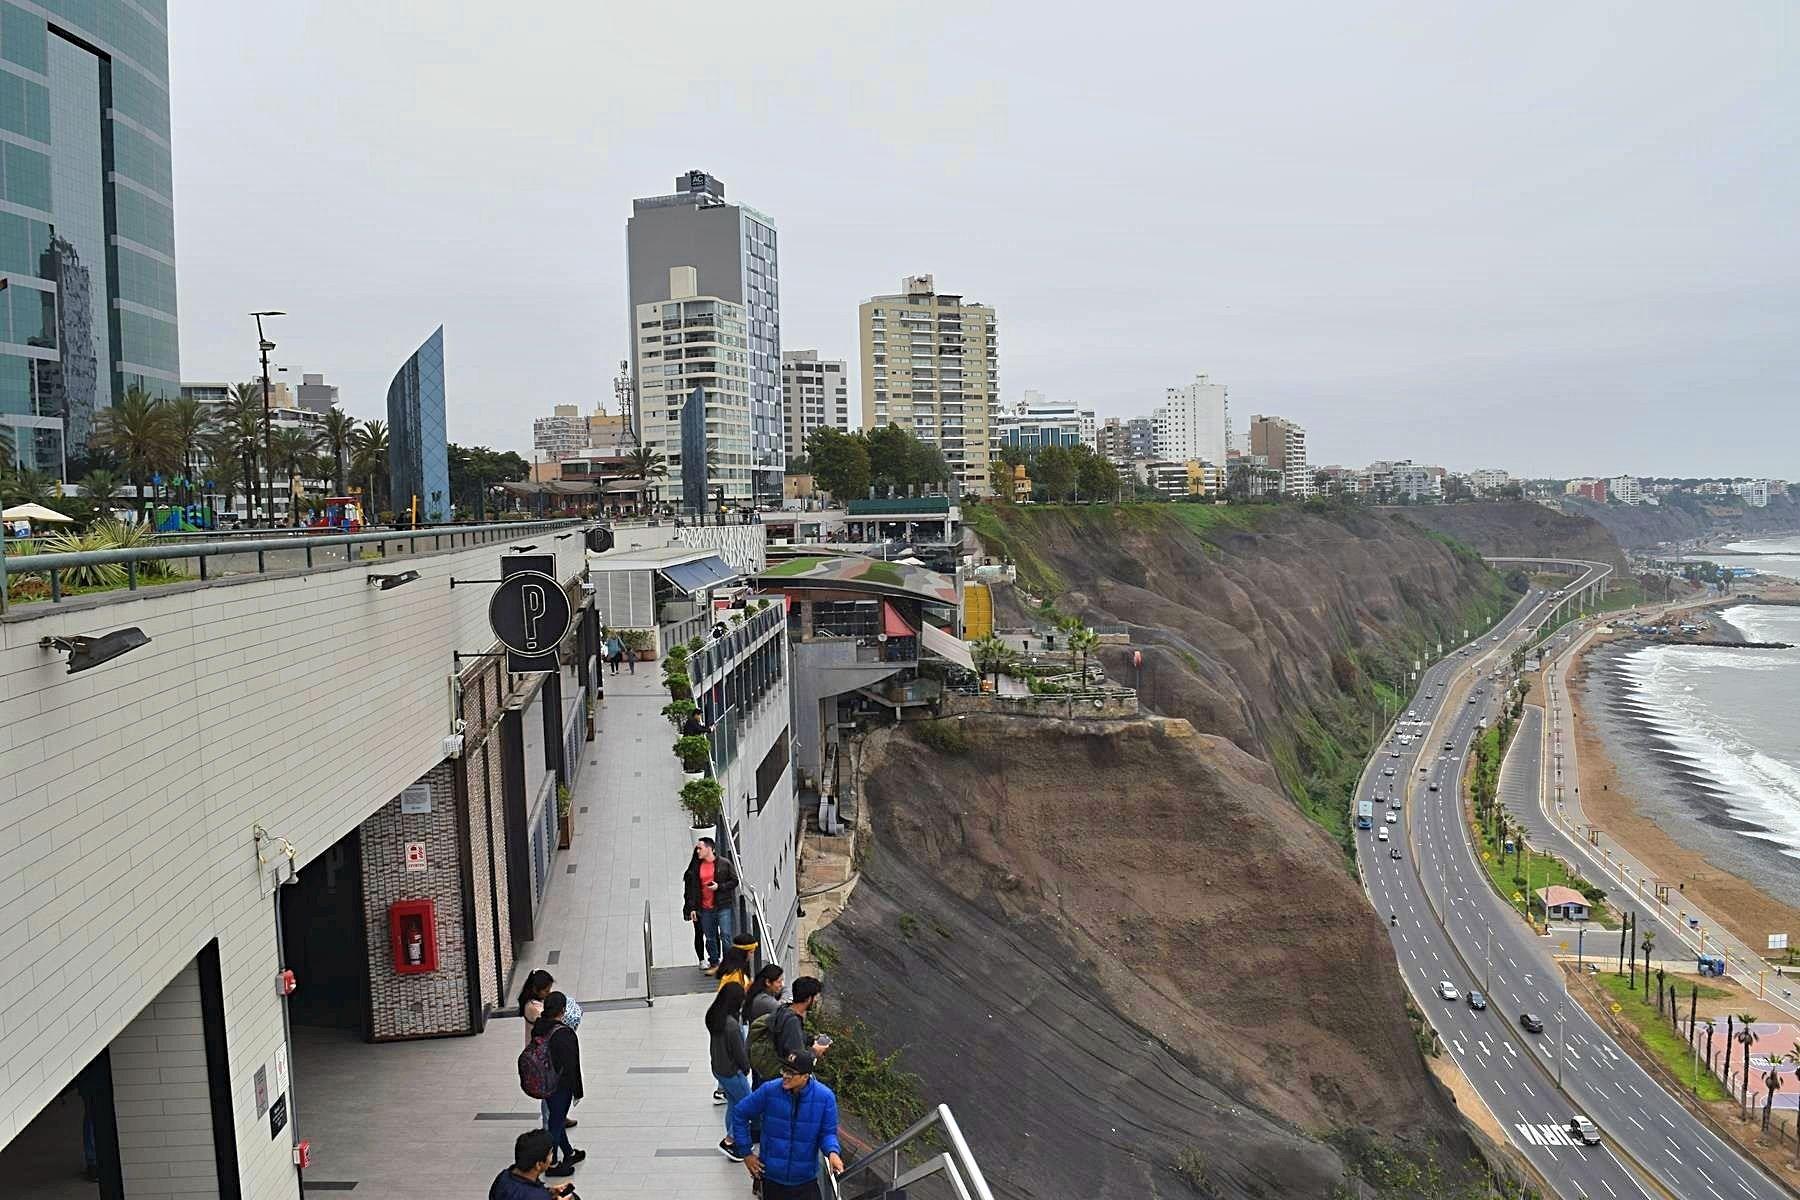 Winkelcentrum Lima LarcoMar Peru